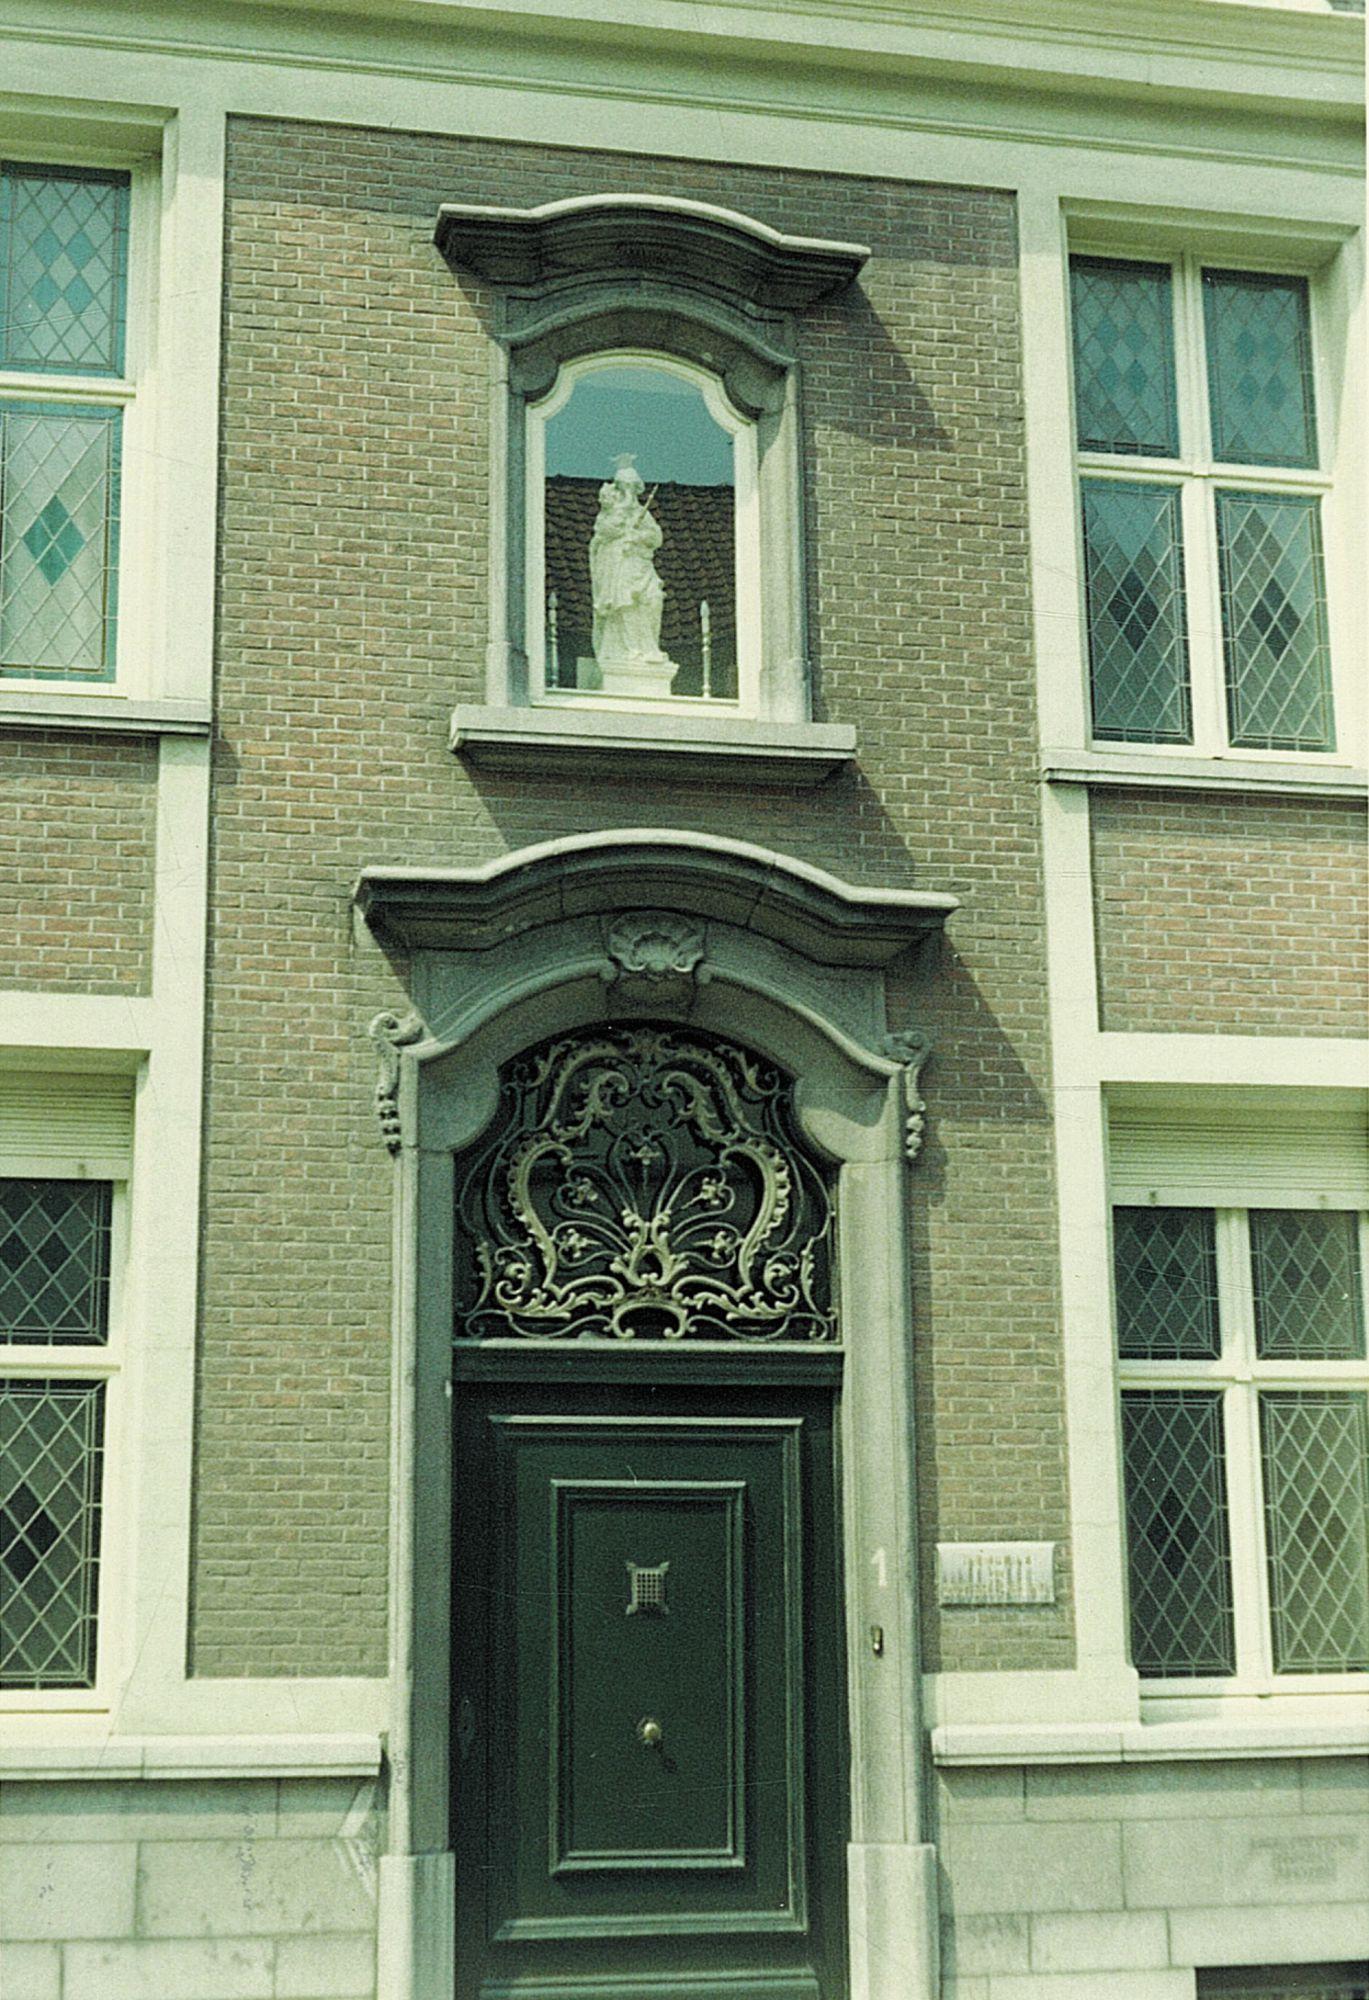 Bersacques Poortje